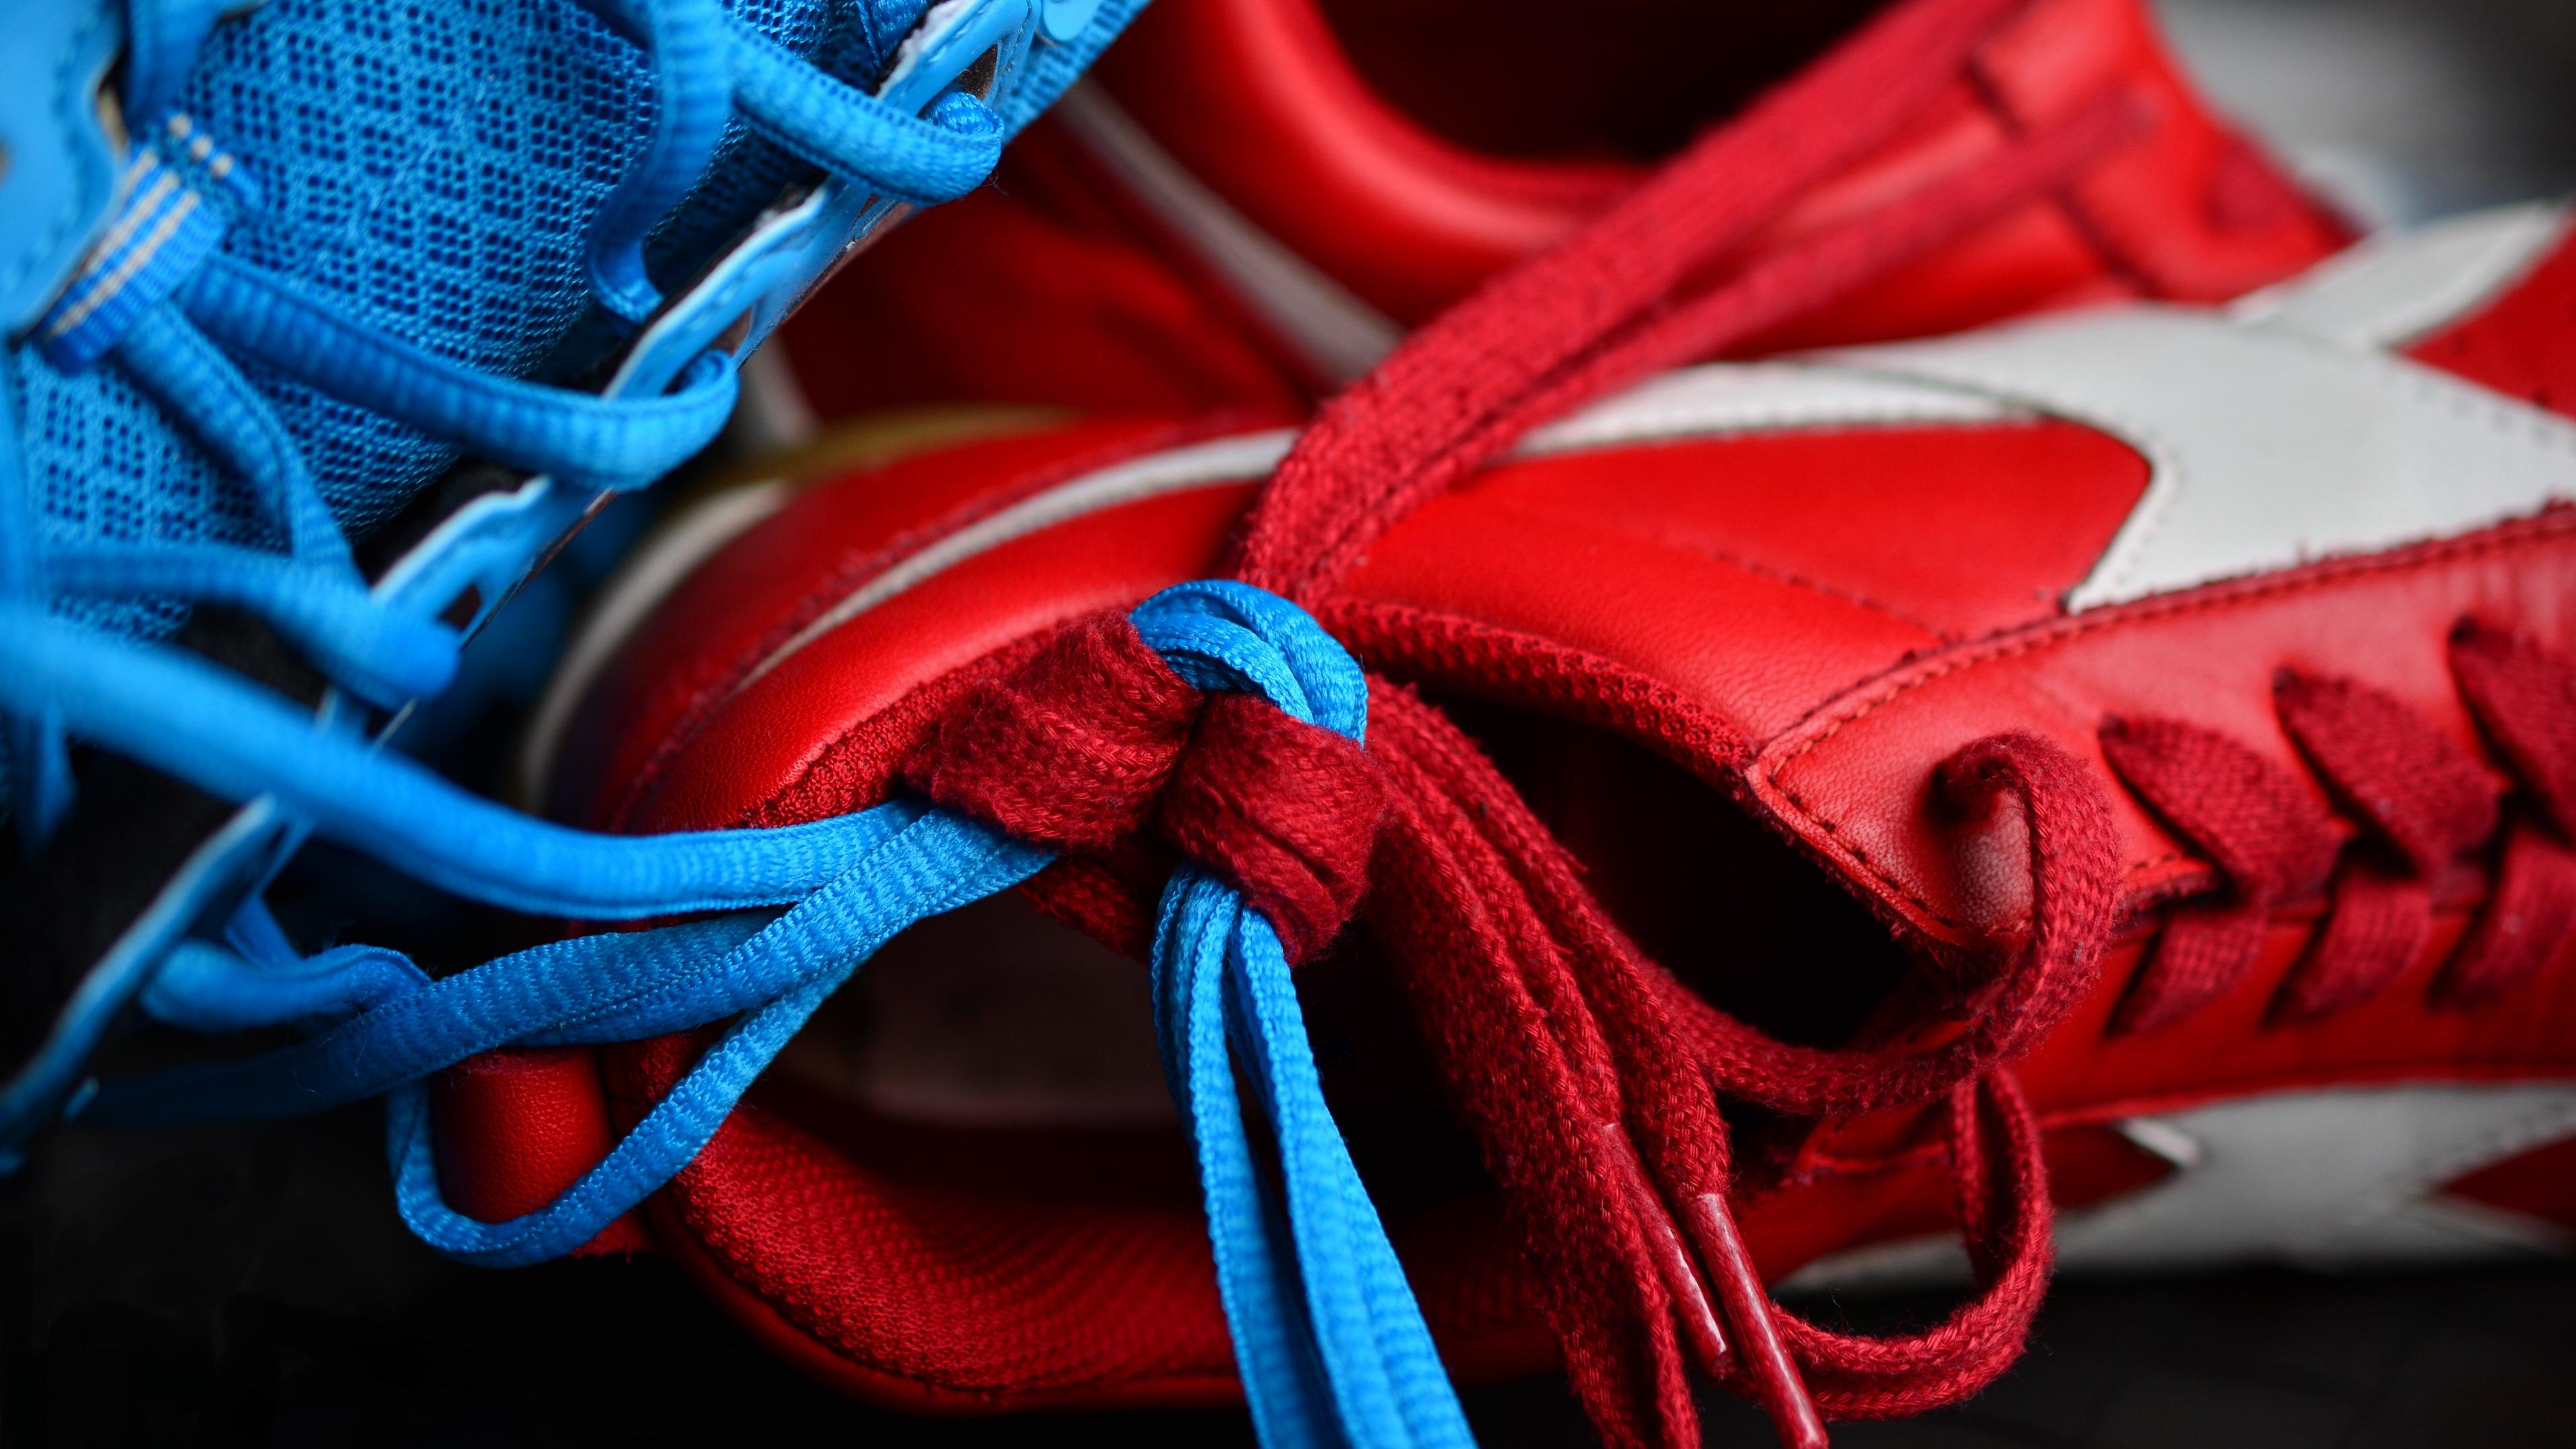 sneakers shoelaces sports 4k 1540061247 - sneakers, shoelaces, sports 4k - Sports, sneakers, shoelaces